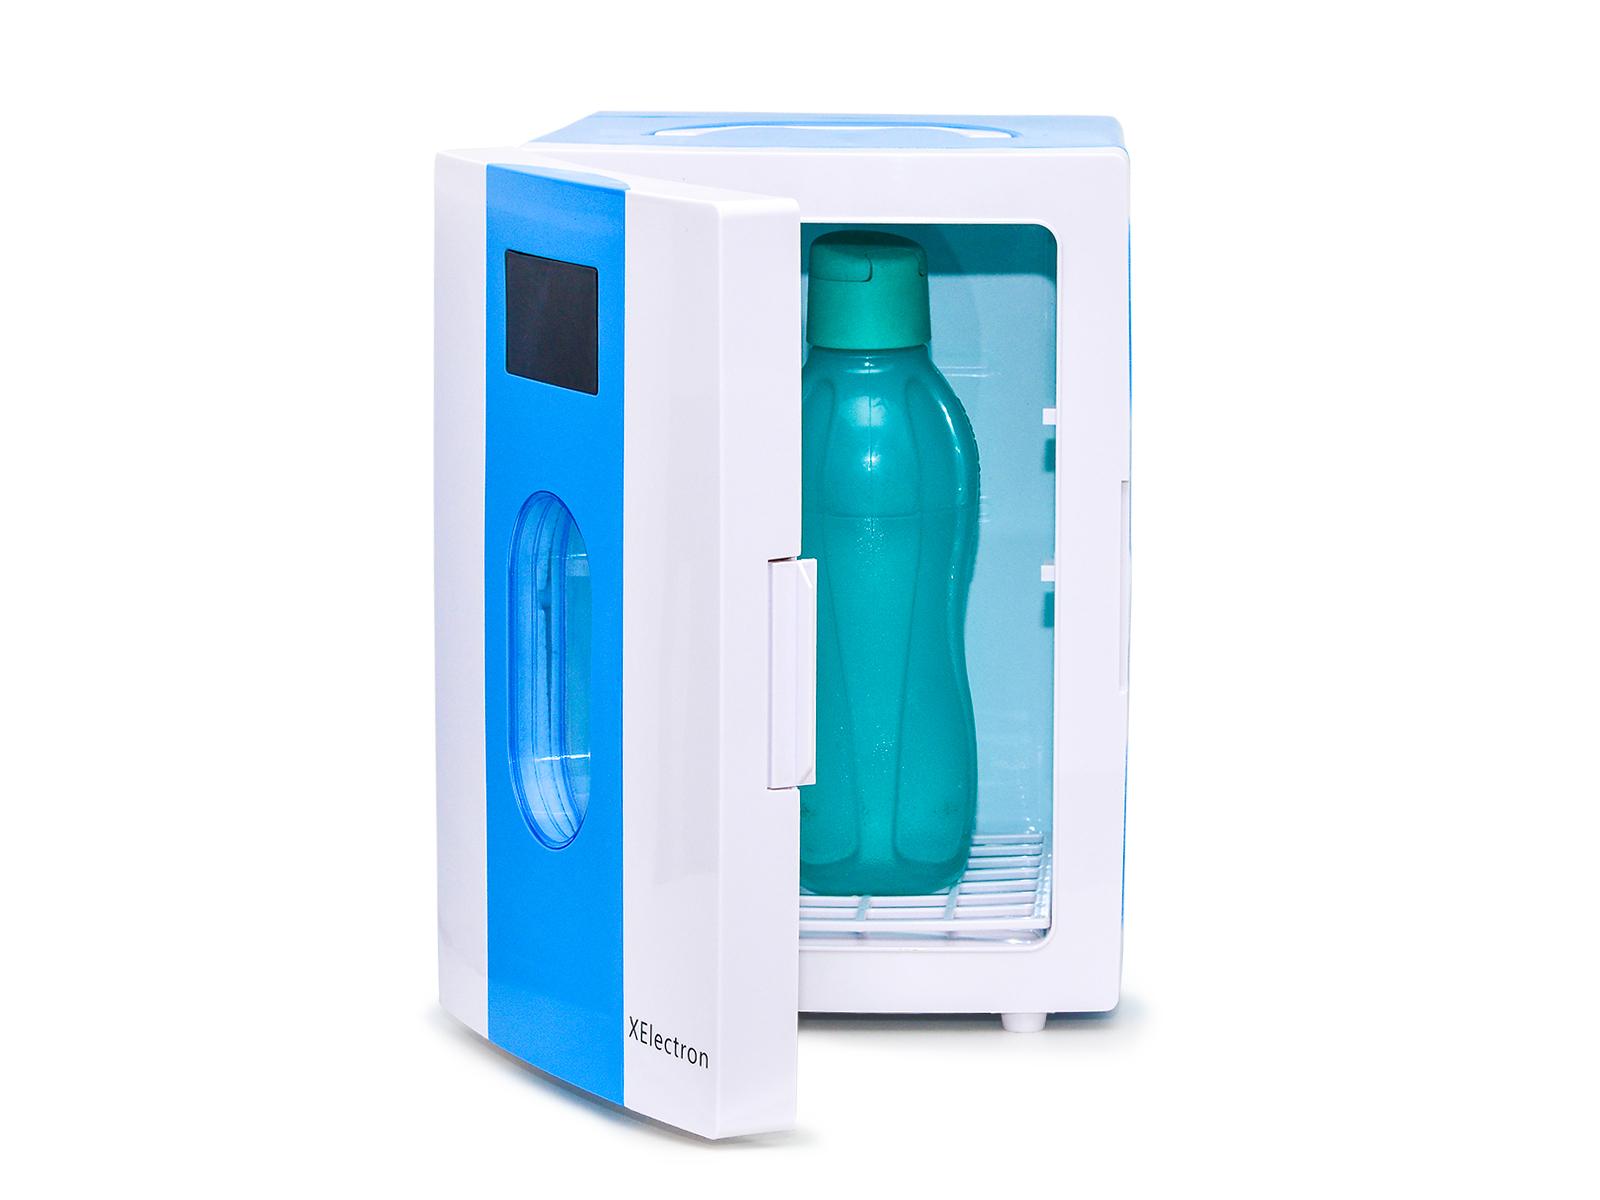 XElectron 10 Litre Multipurpose Mini Fridge Cooler